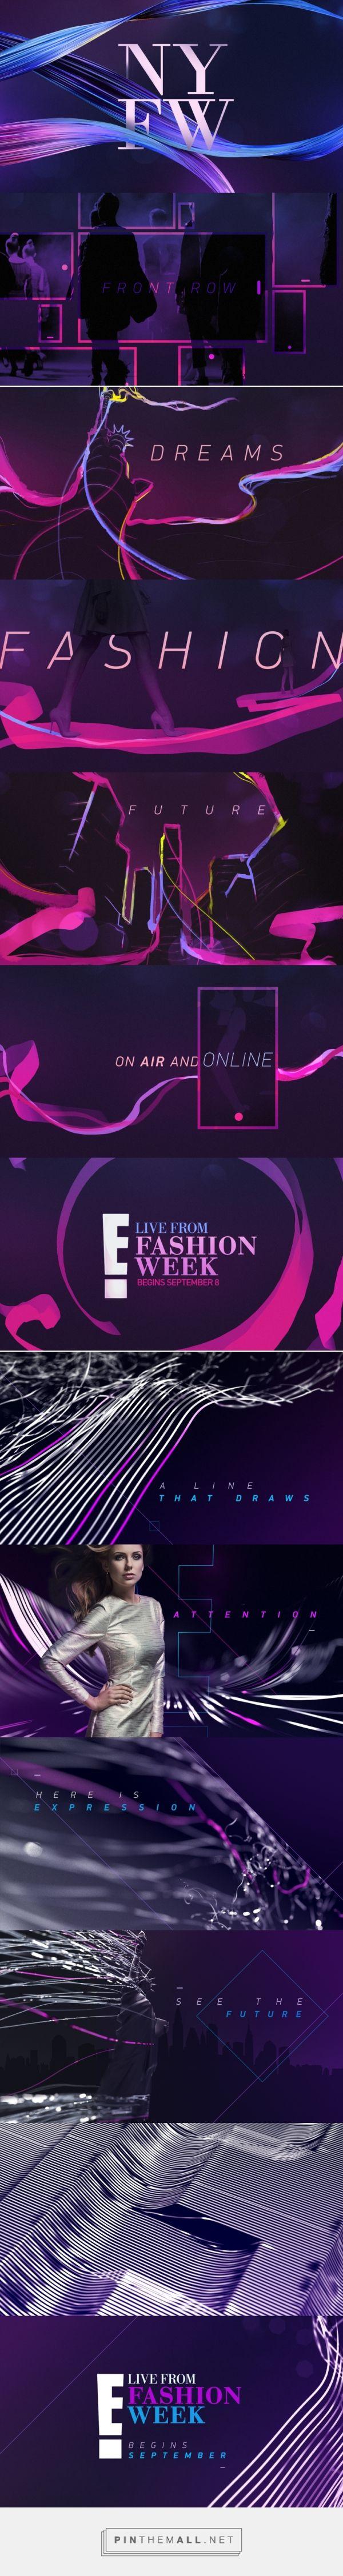 E! | New York Fashion Week on Behance - created on 2017-08-18 19:48:55